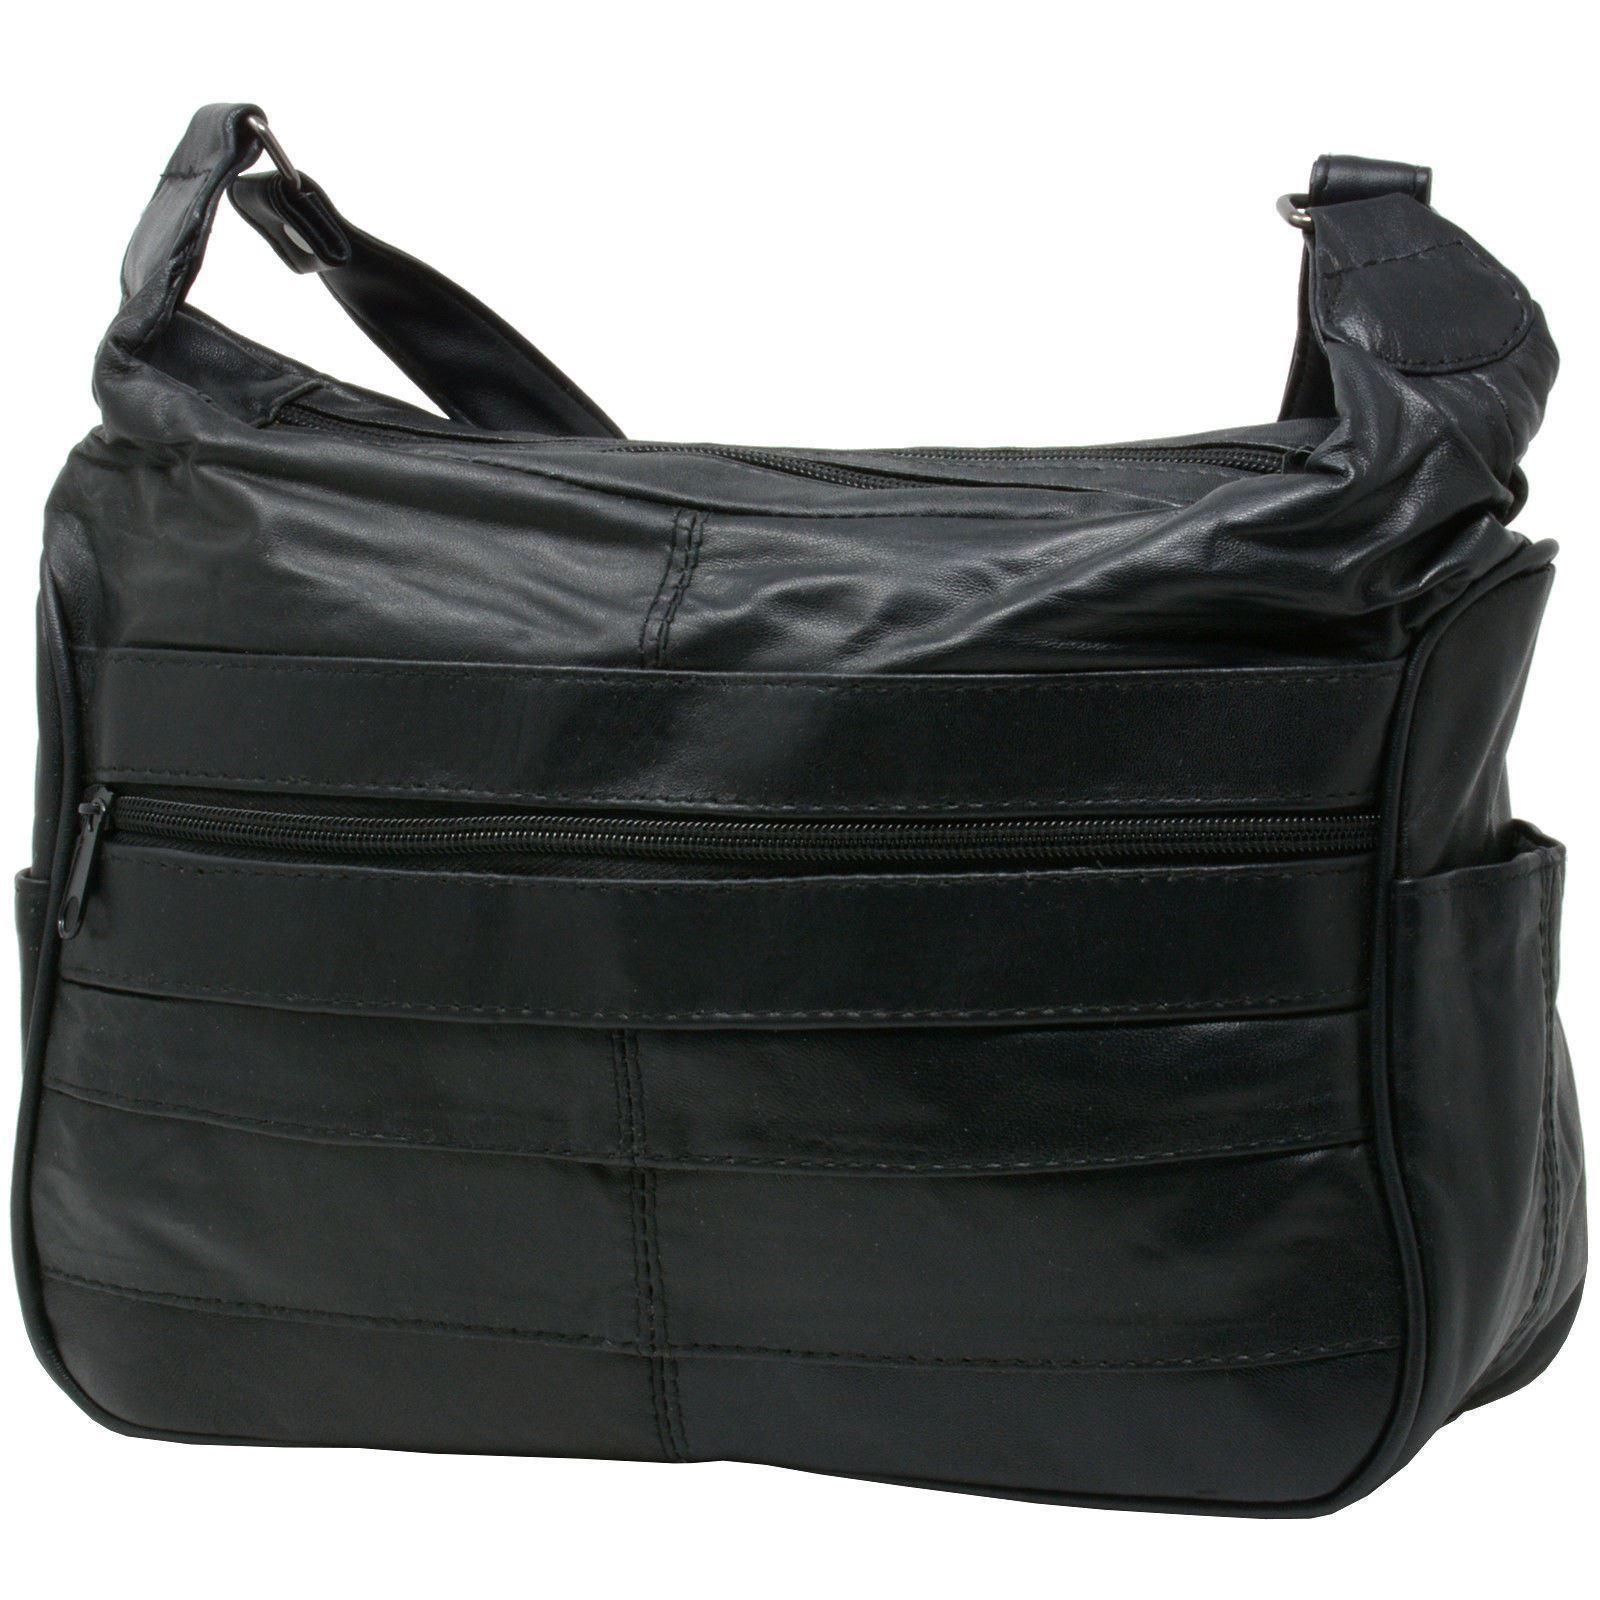 18 98 Usd Women S Leather Handbag Mid Size Shoulder Bag Purse Tote W Multi Pockets New Womens Cute Tumblr